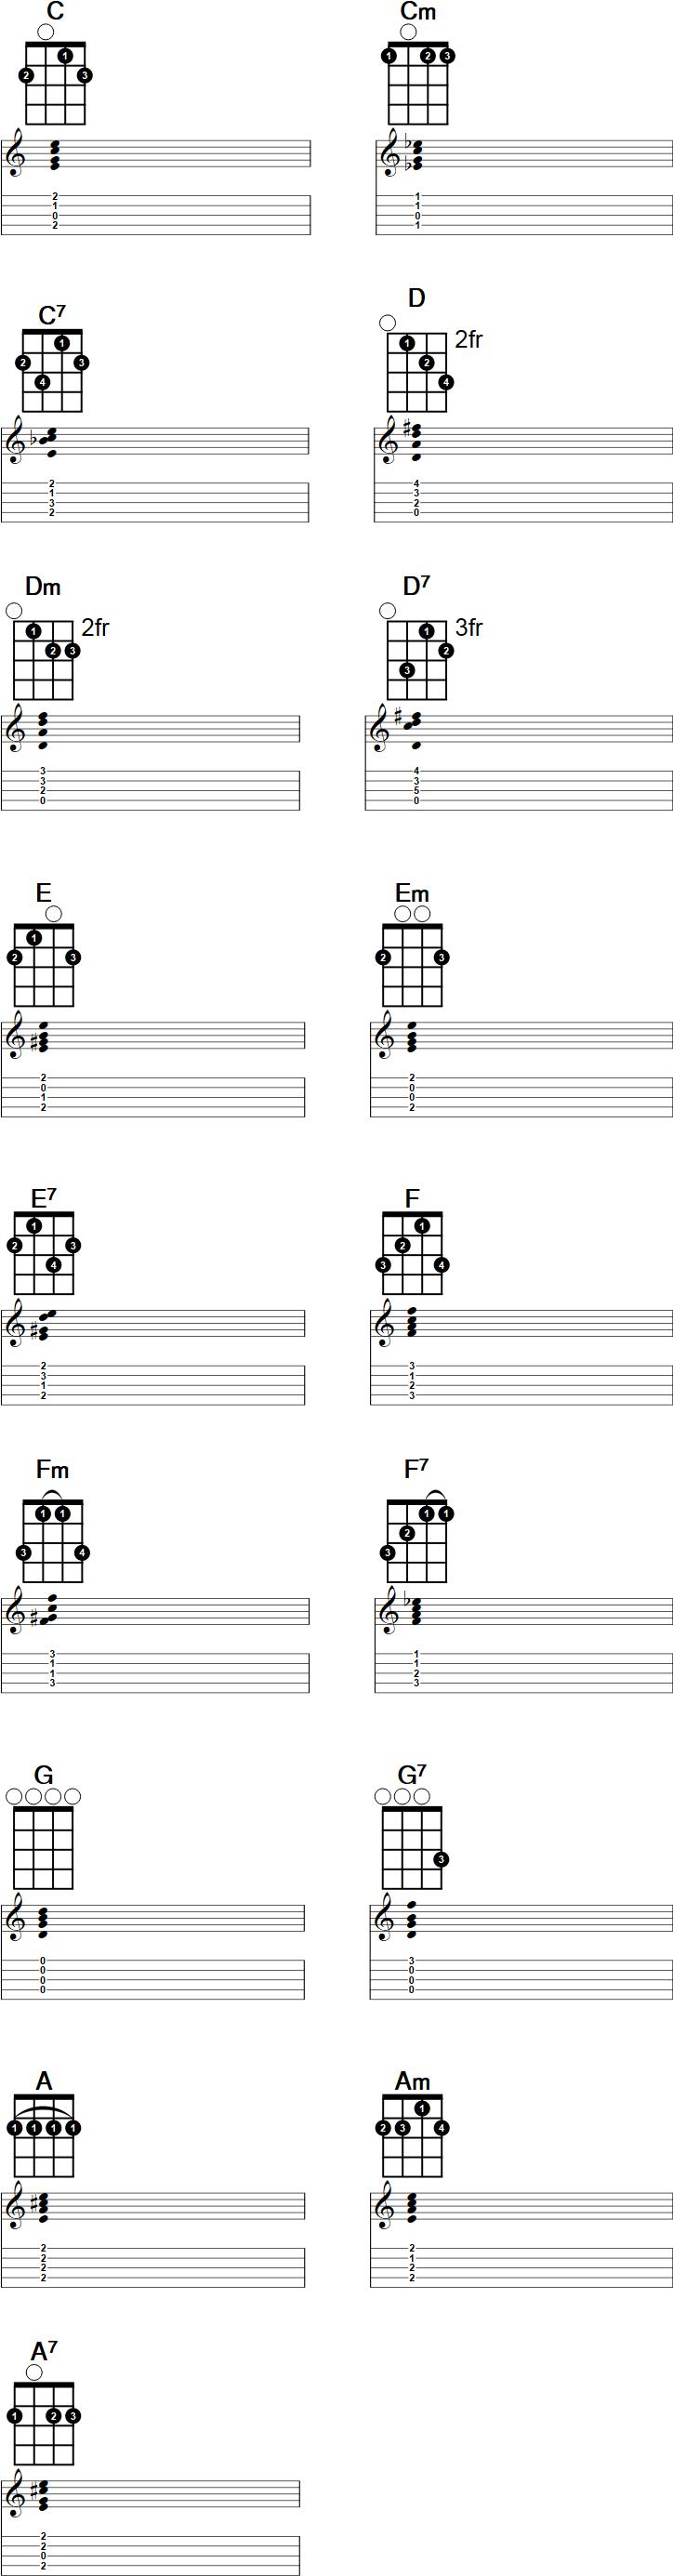 Easy Banjo Chords Printable Pdf Download At Httpbanjochords